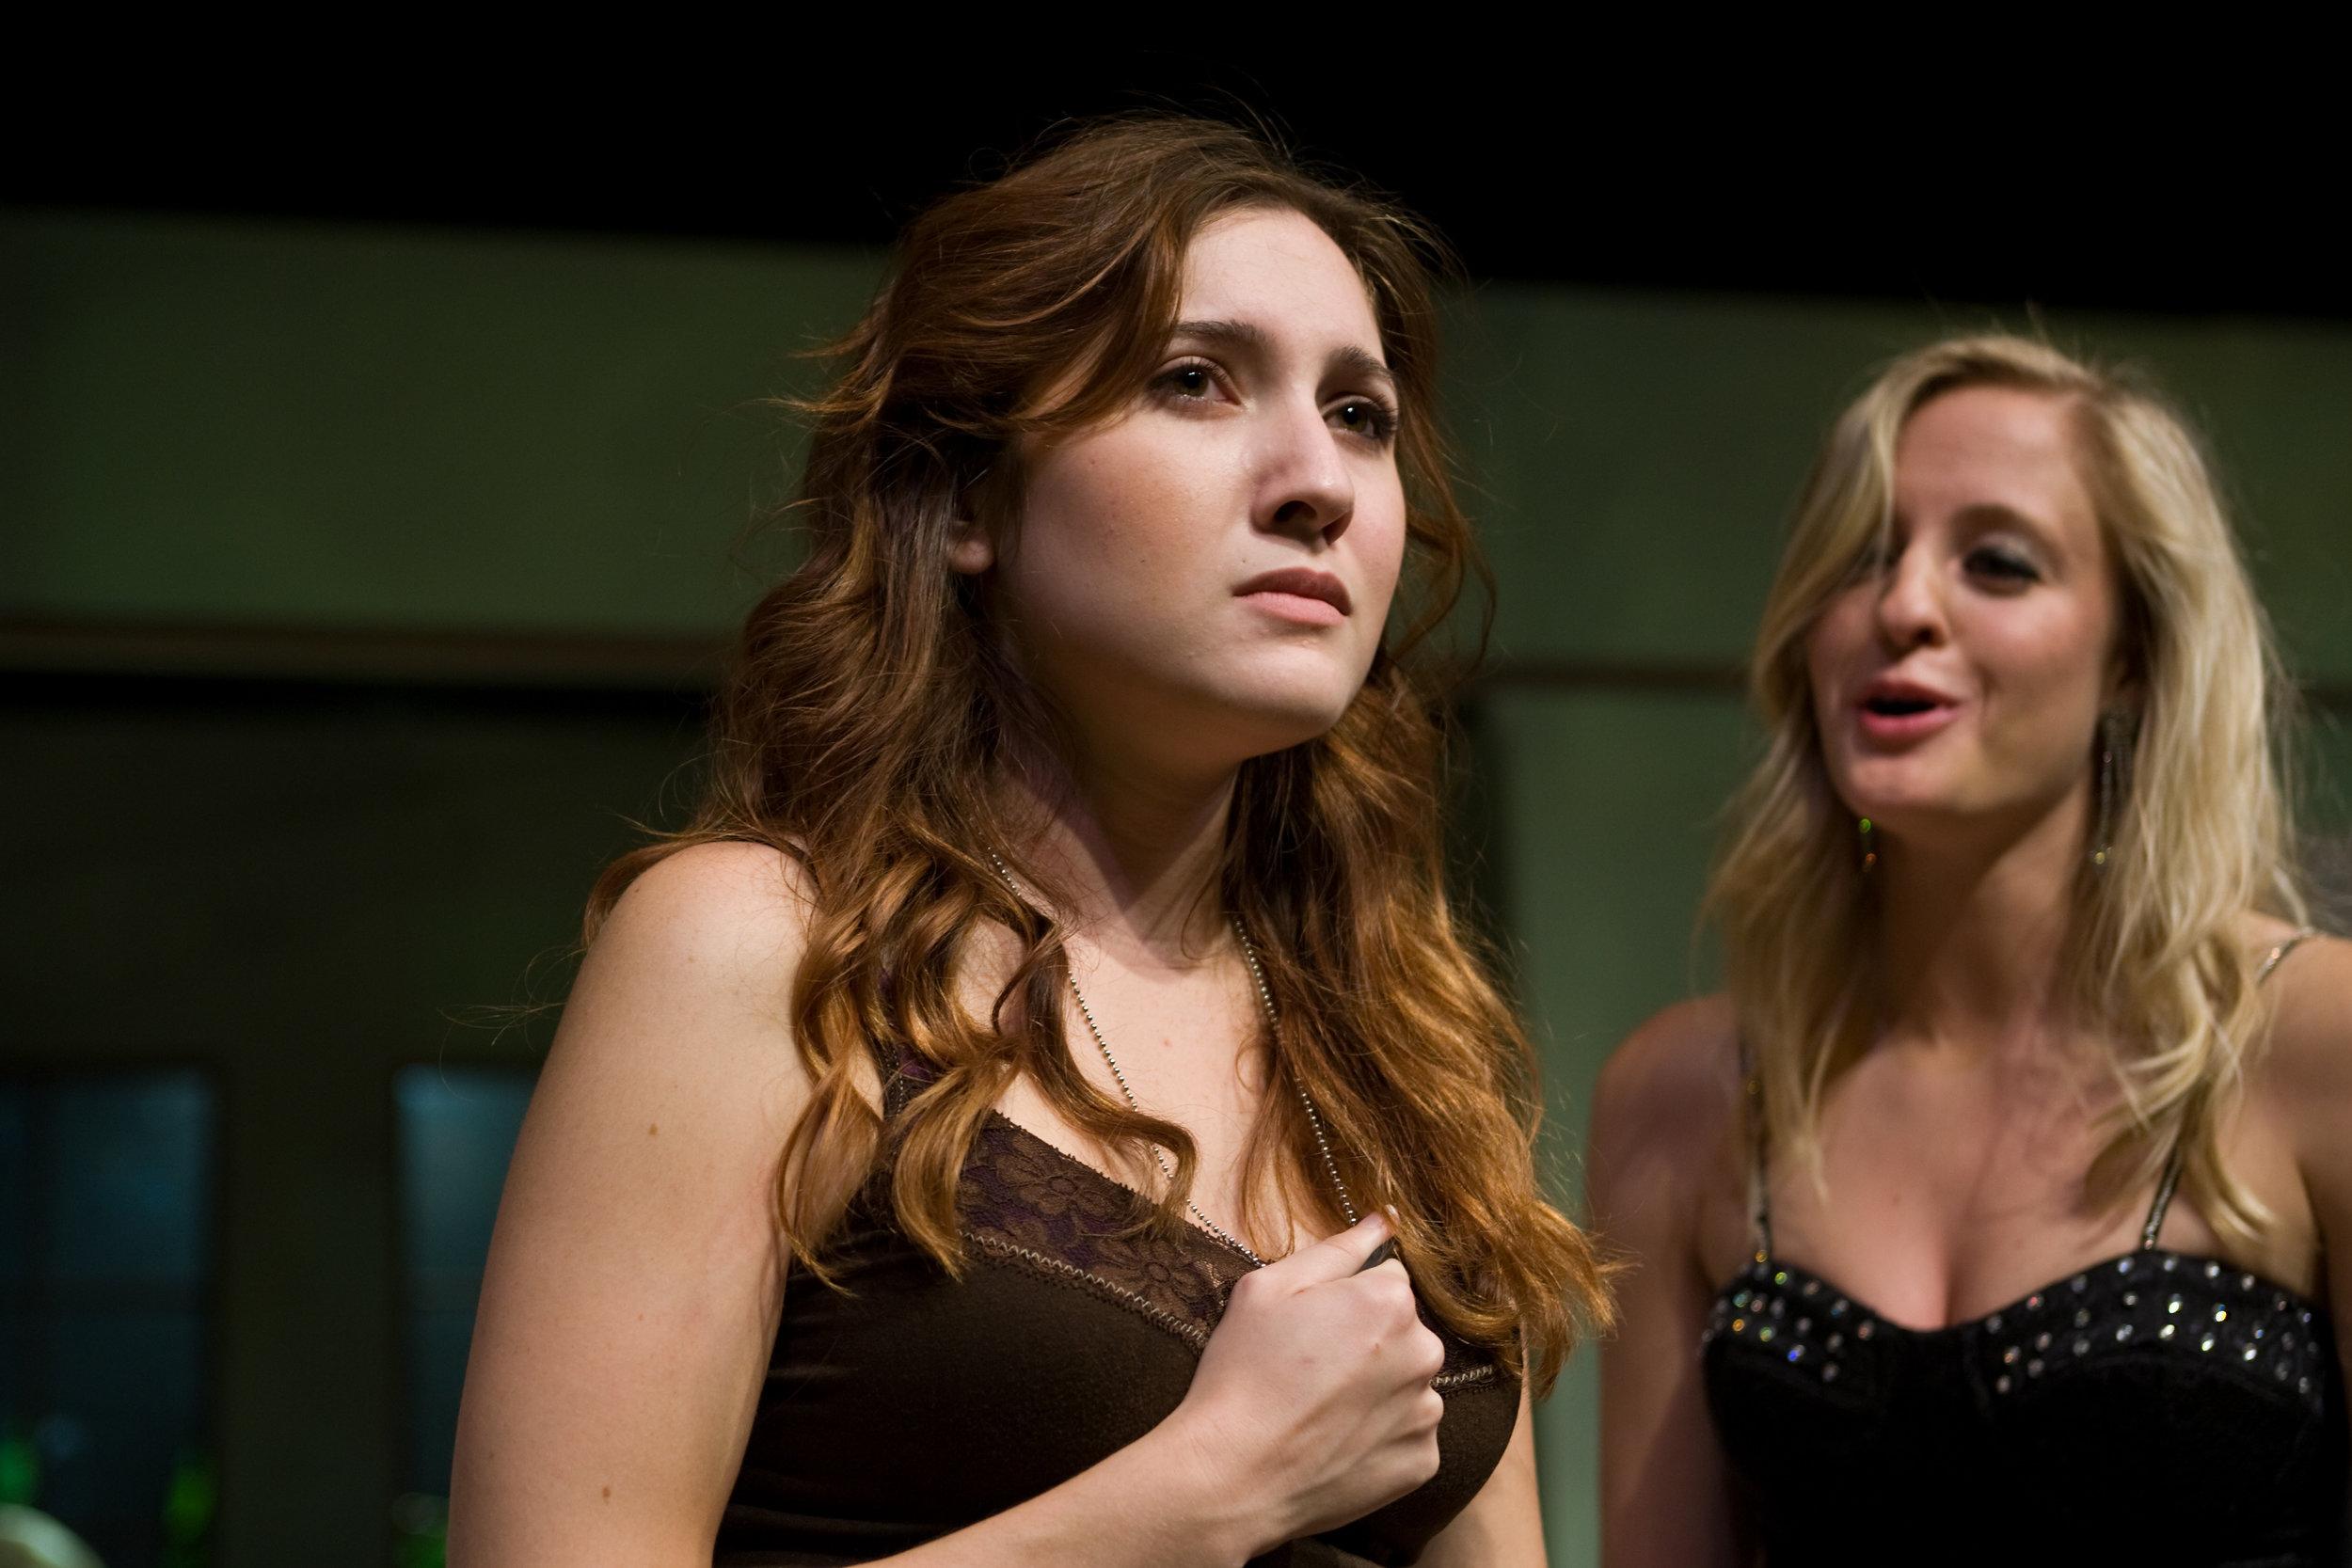 2012 cast, Santa Ana College: Megan King & Cynthia Aldrich